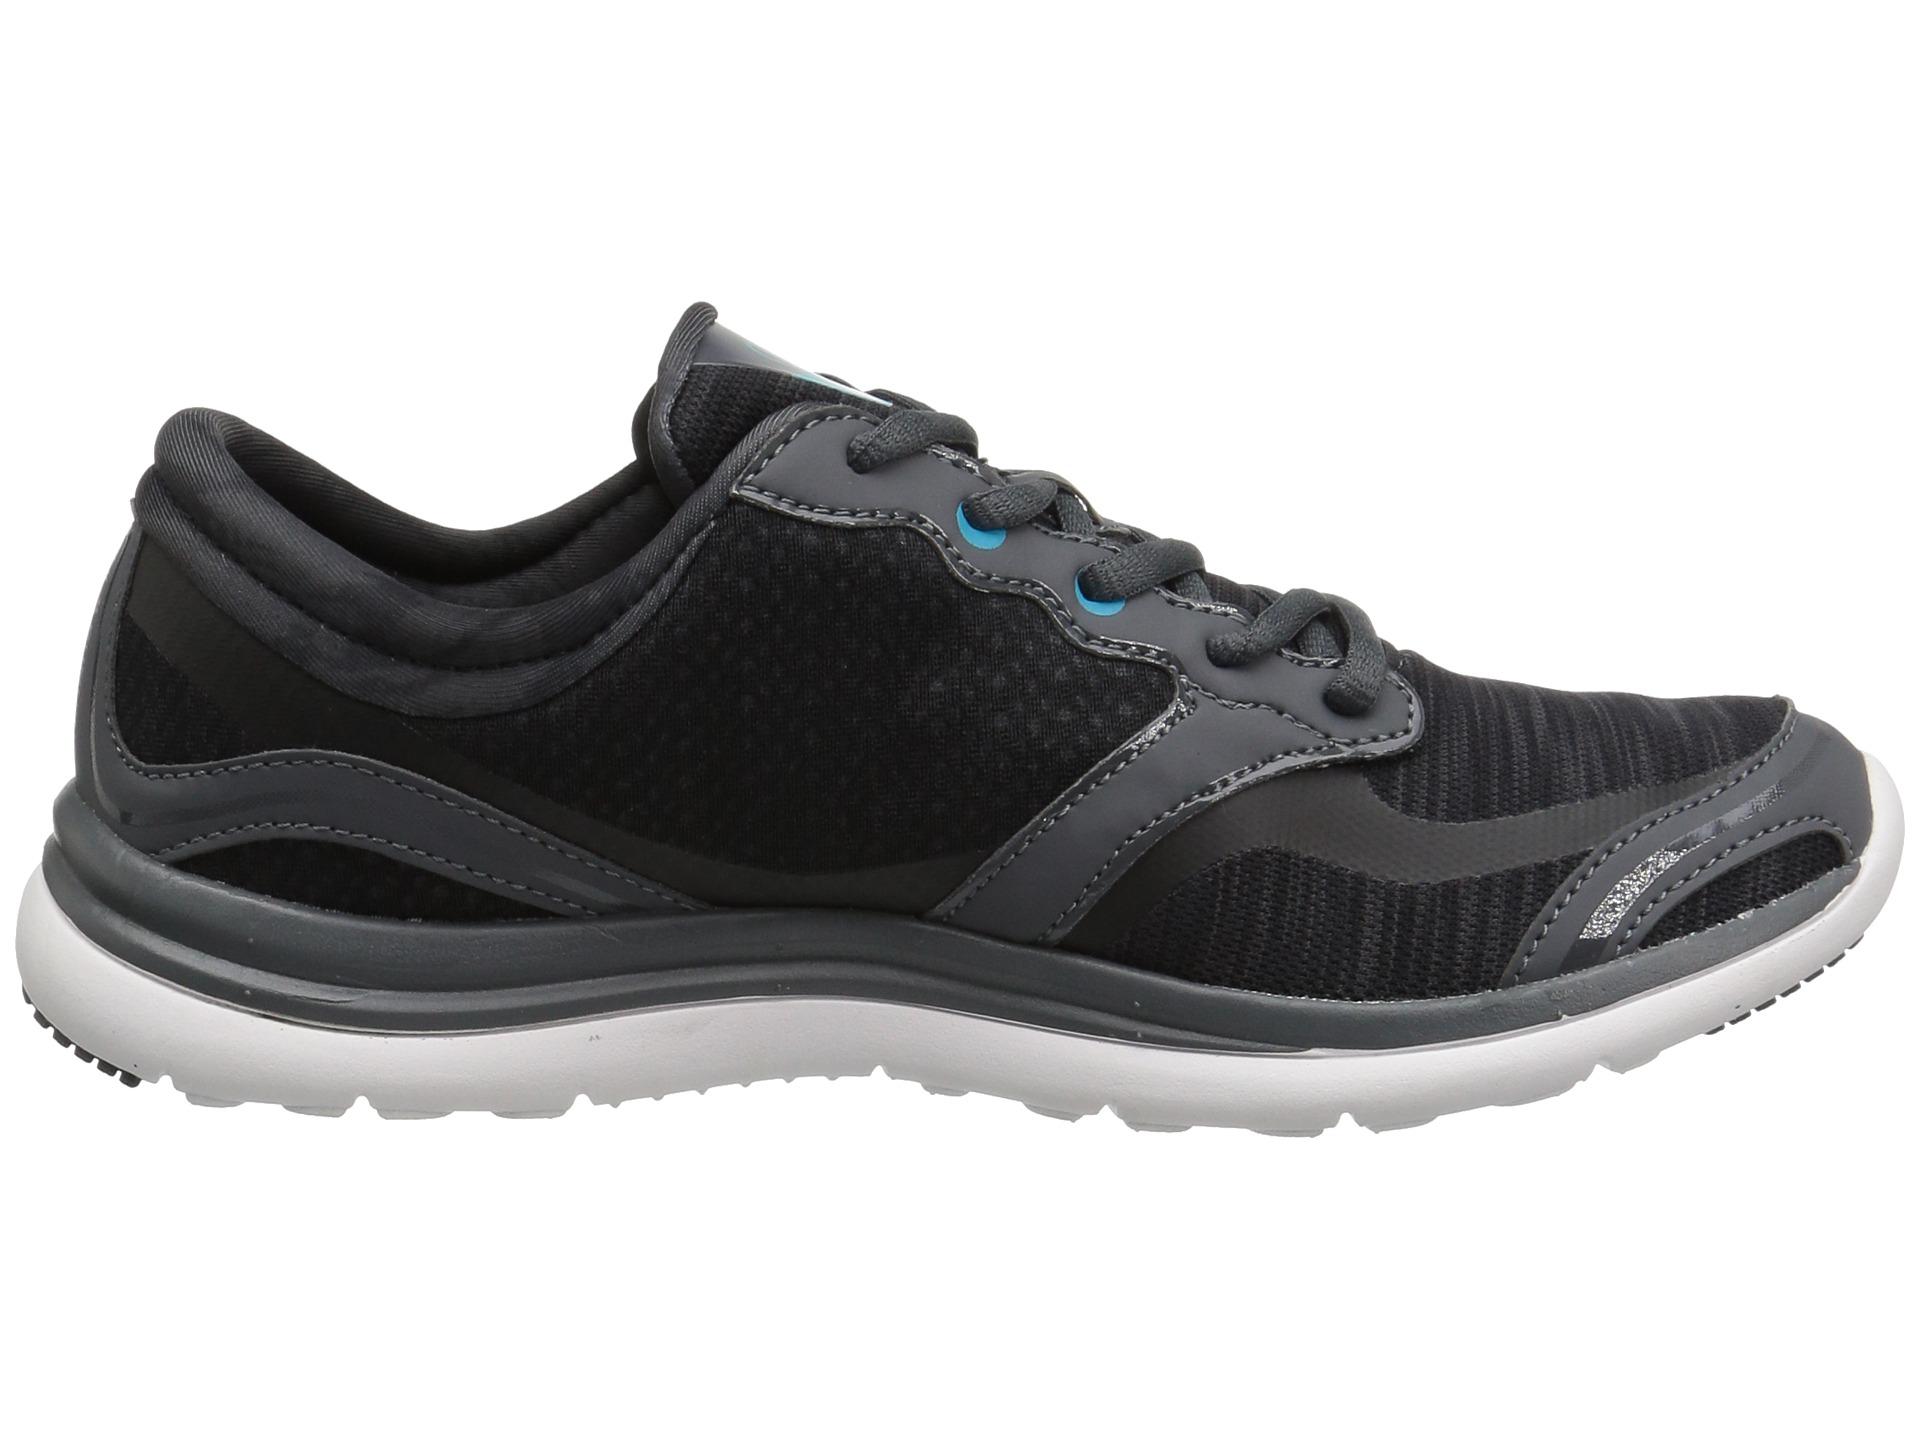 Ryka Carrara Running Shoes